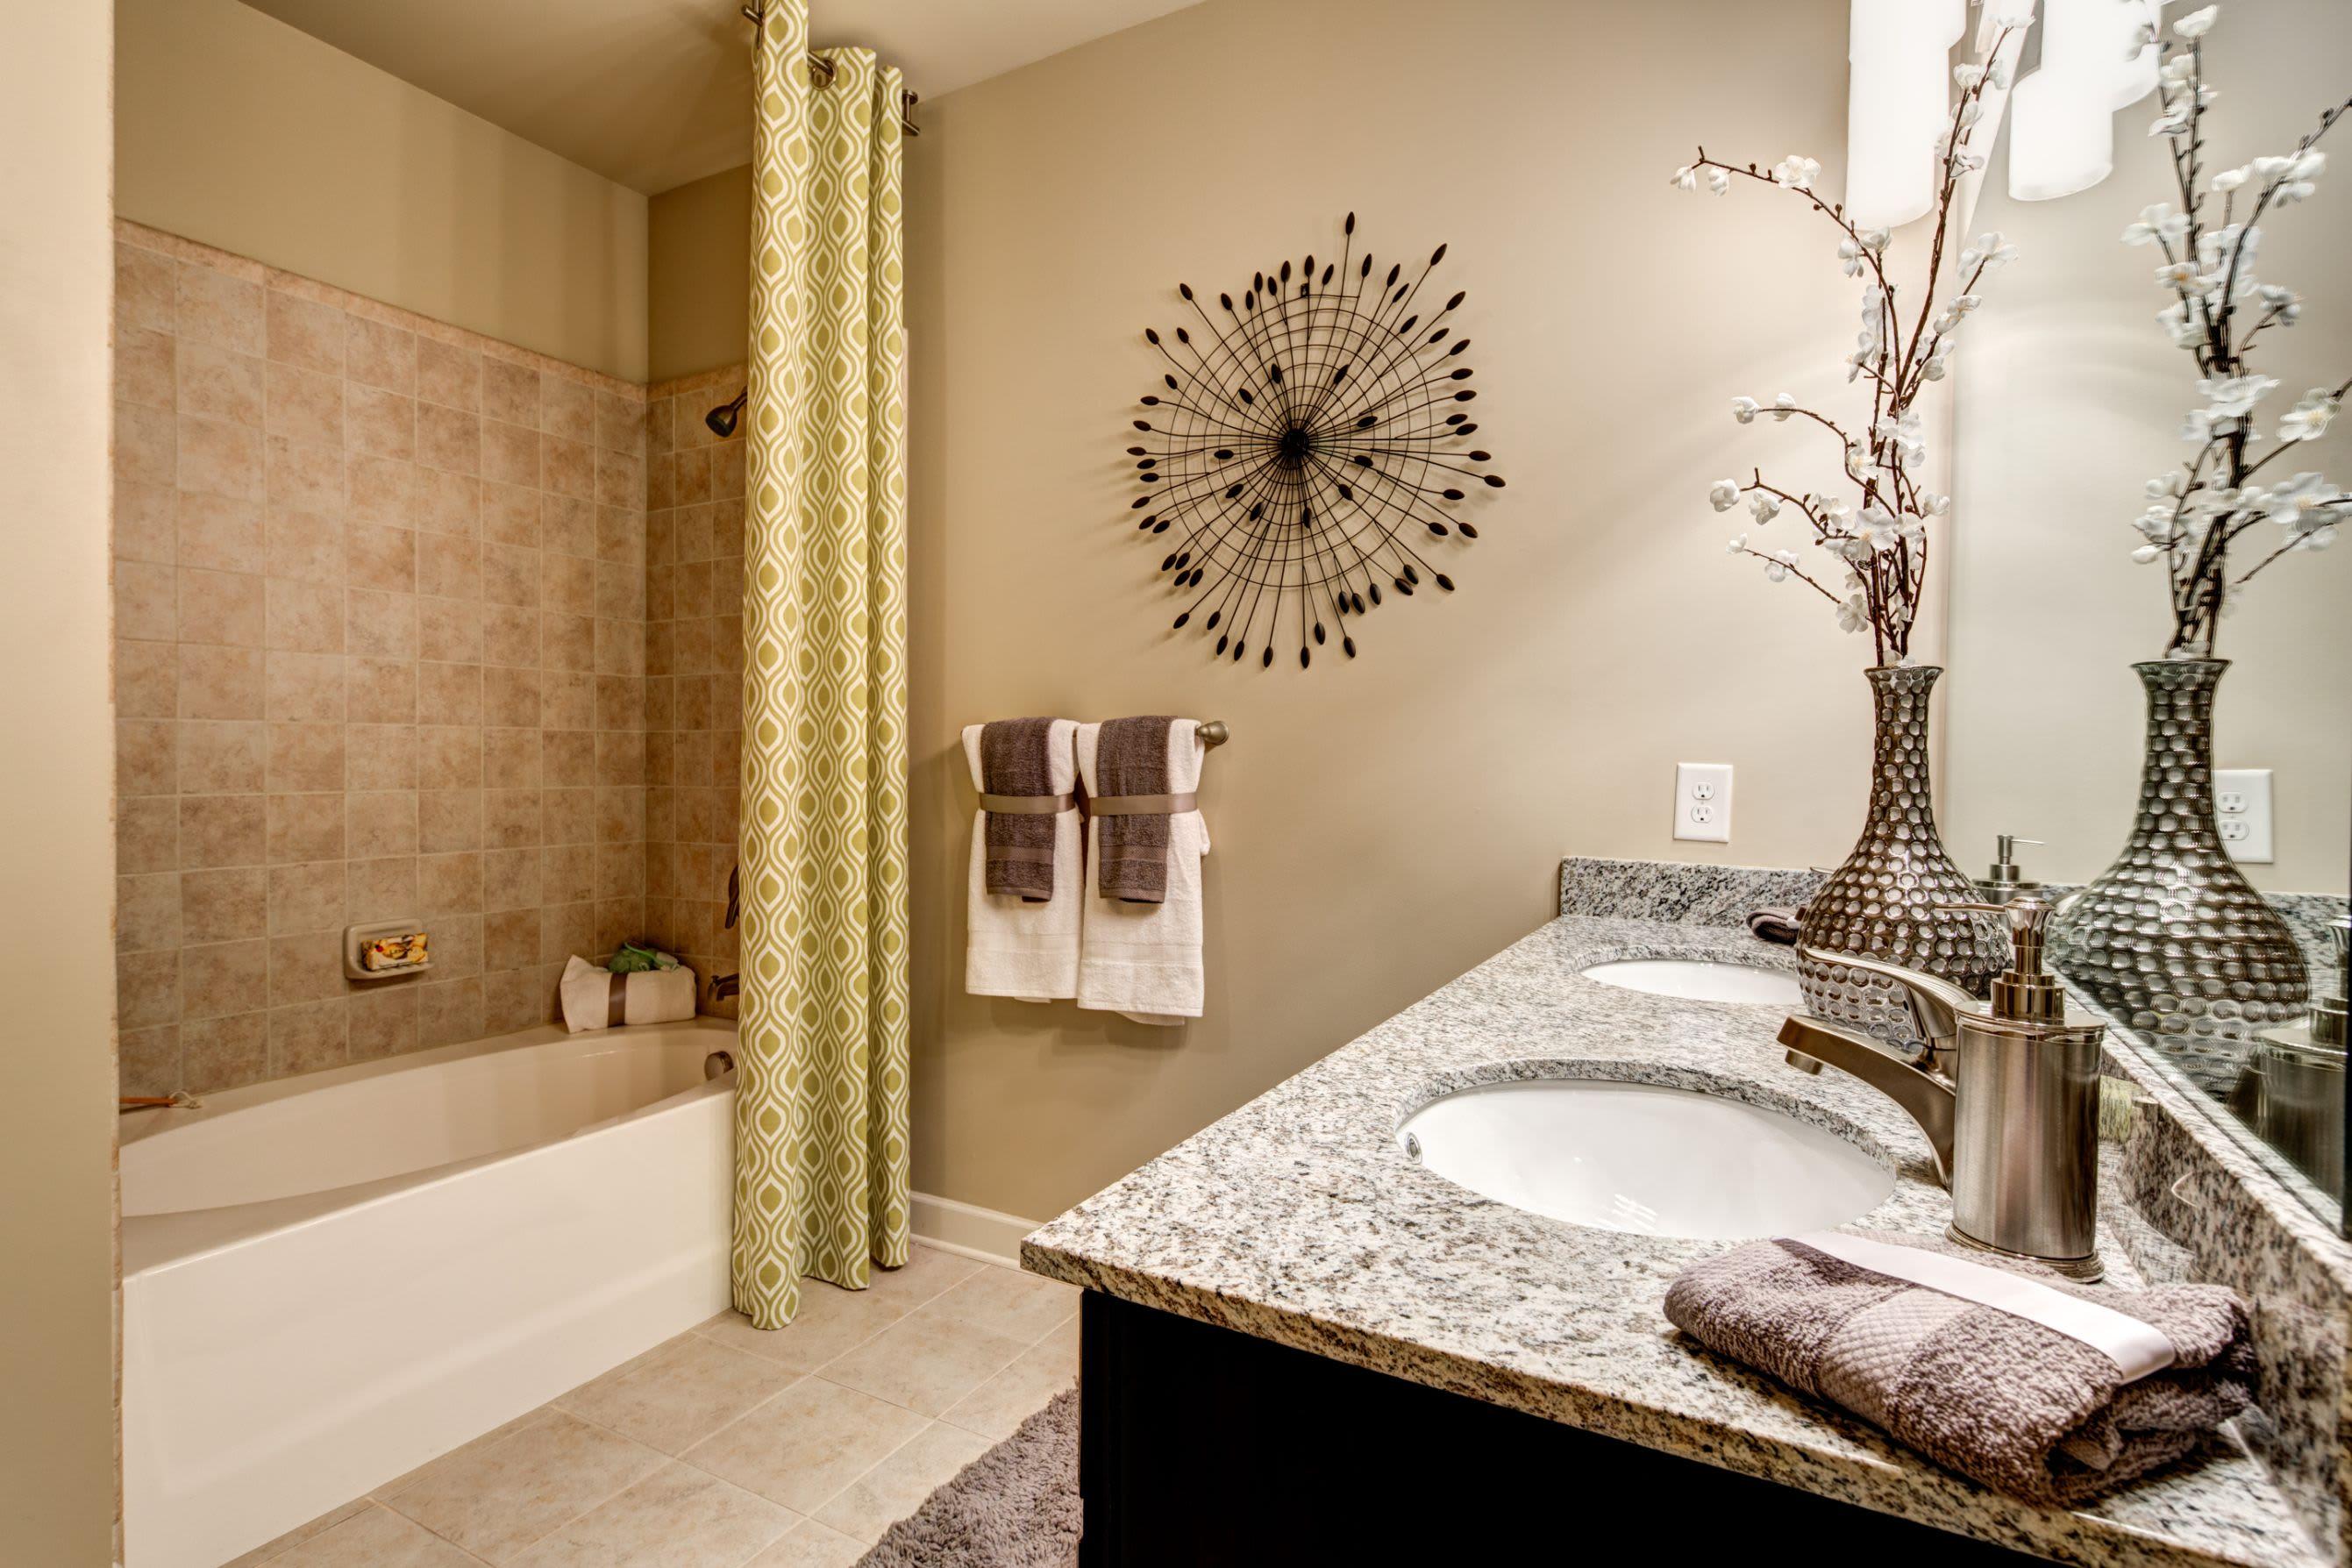 Clean bathroom at Marquis at Morrison Plantation in Mooresville, North Carolina